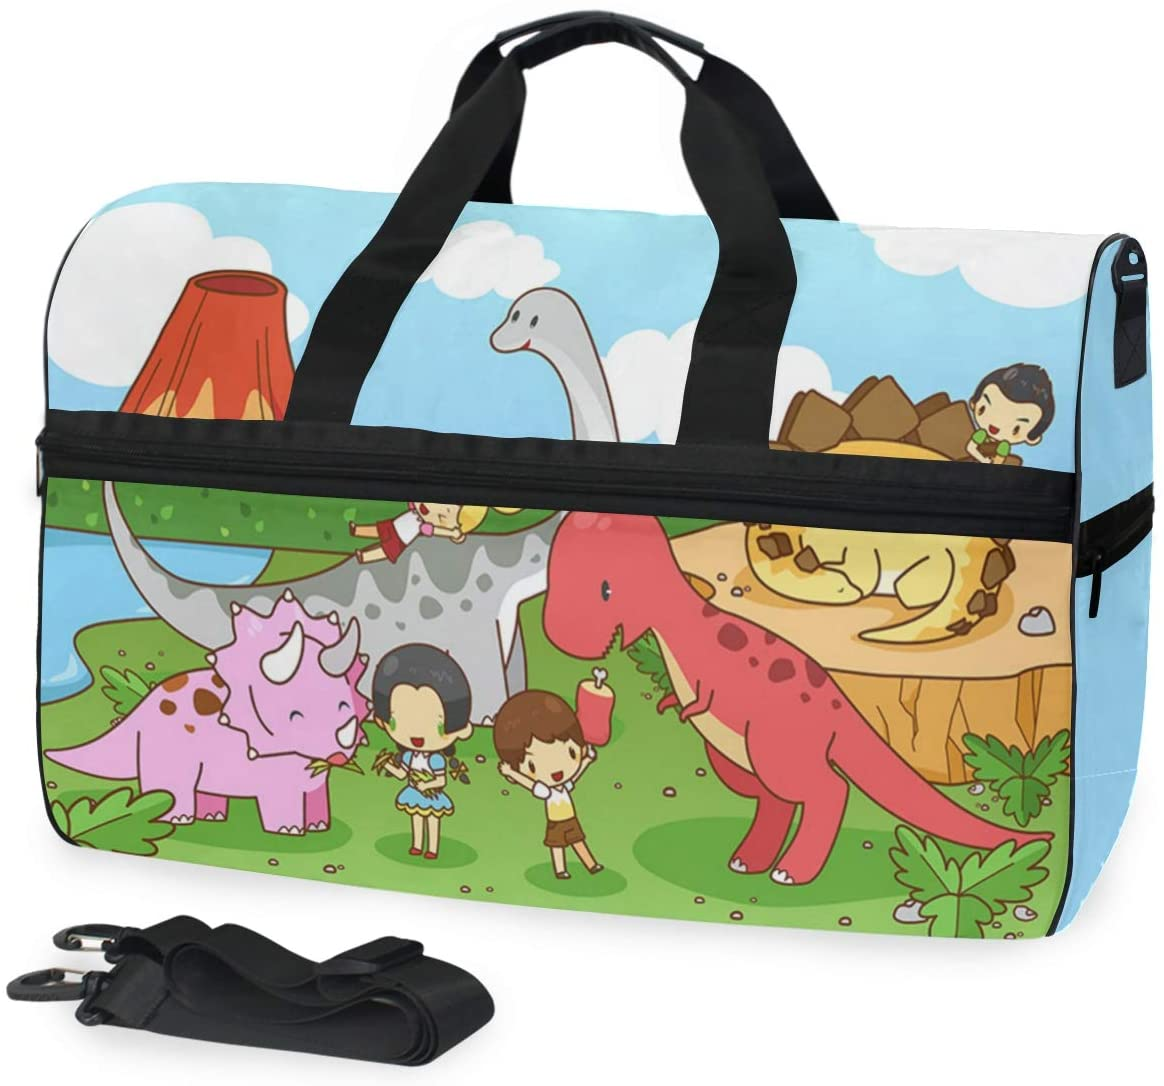 ALAZA Cartoon Dinosaur World Sports Gym Duffel Bag Travel Luggage Handbag Shoulder Bag with Shoes Compartment for Men Women